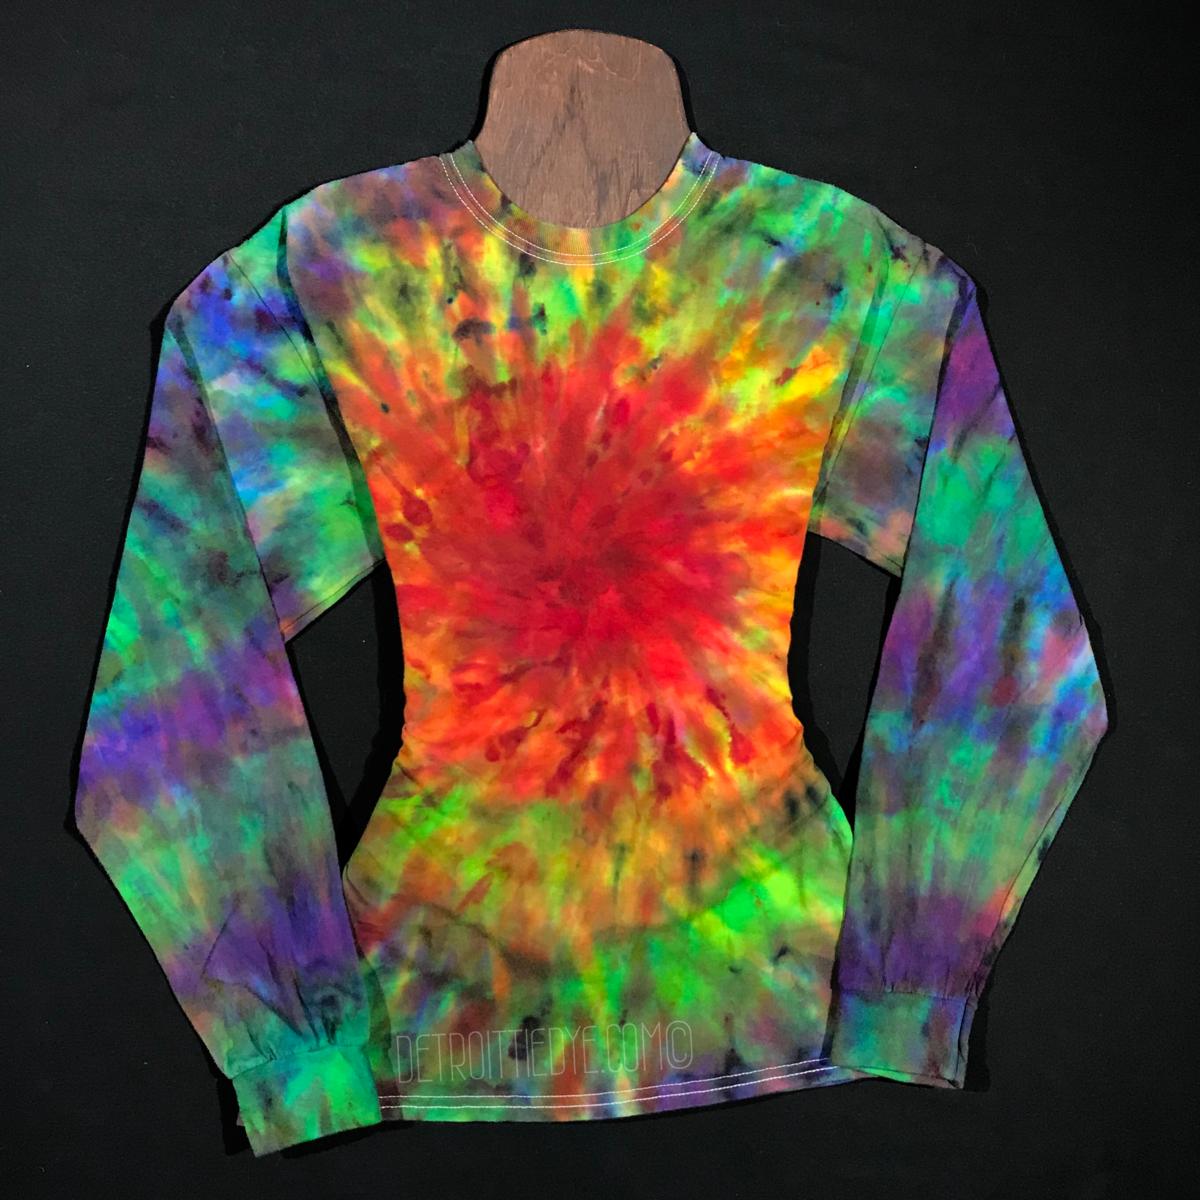 138b2d1e995977 Size Medium Long Sleeve Tie Dye Shirt • Rainbow Spiral Ice Dye – Detroit Tie  Dye Co.